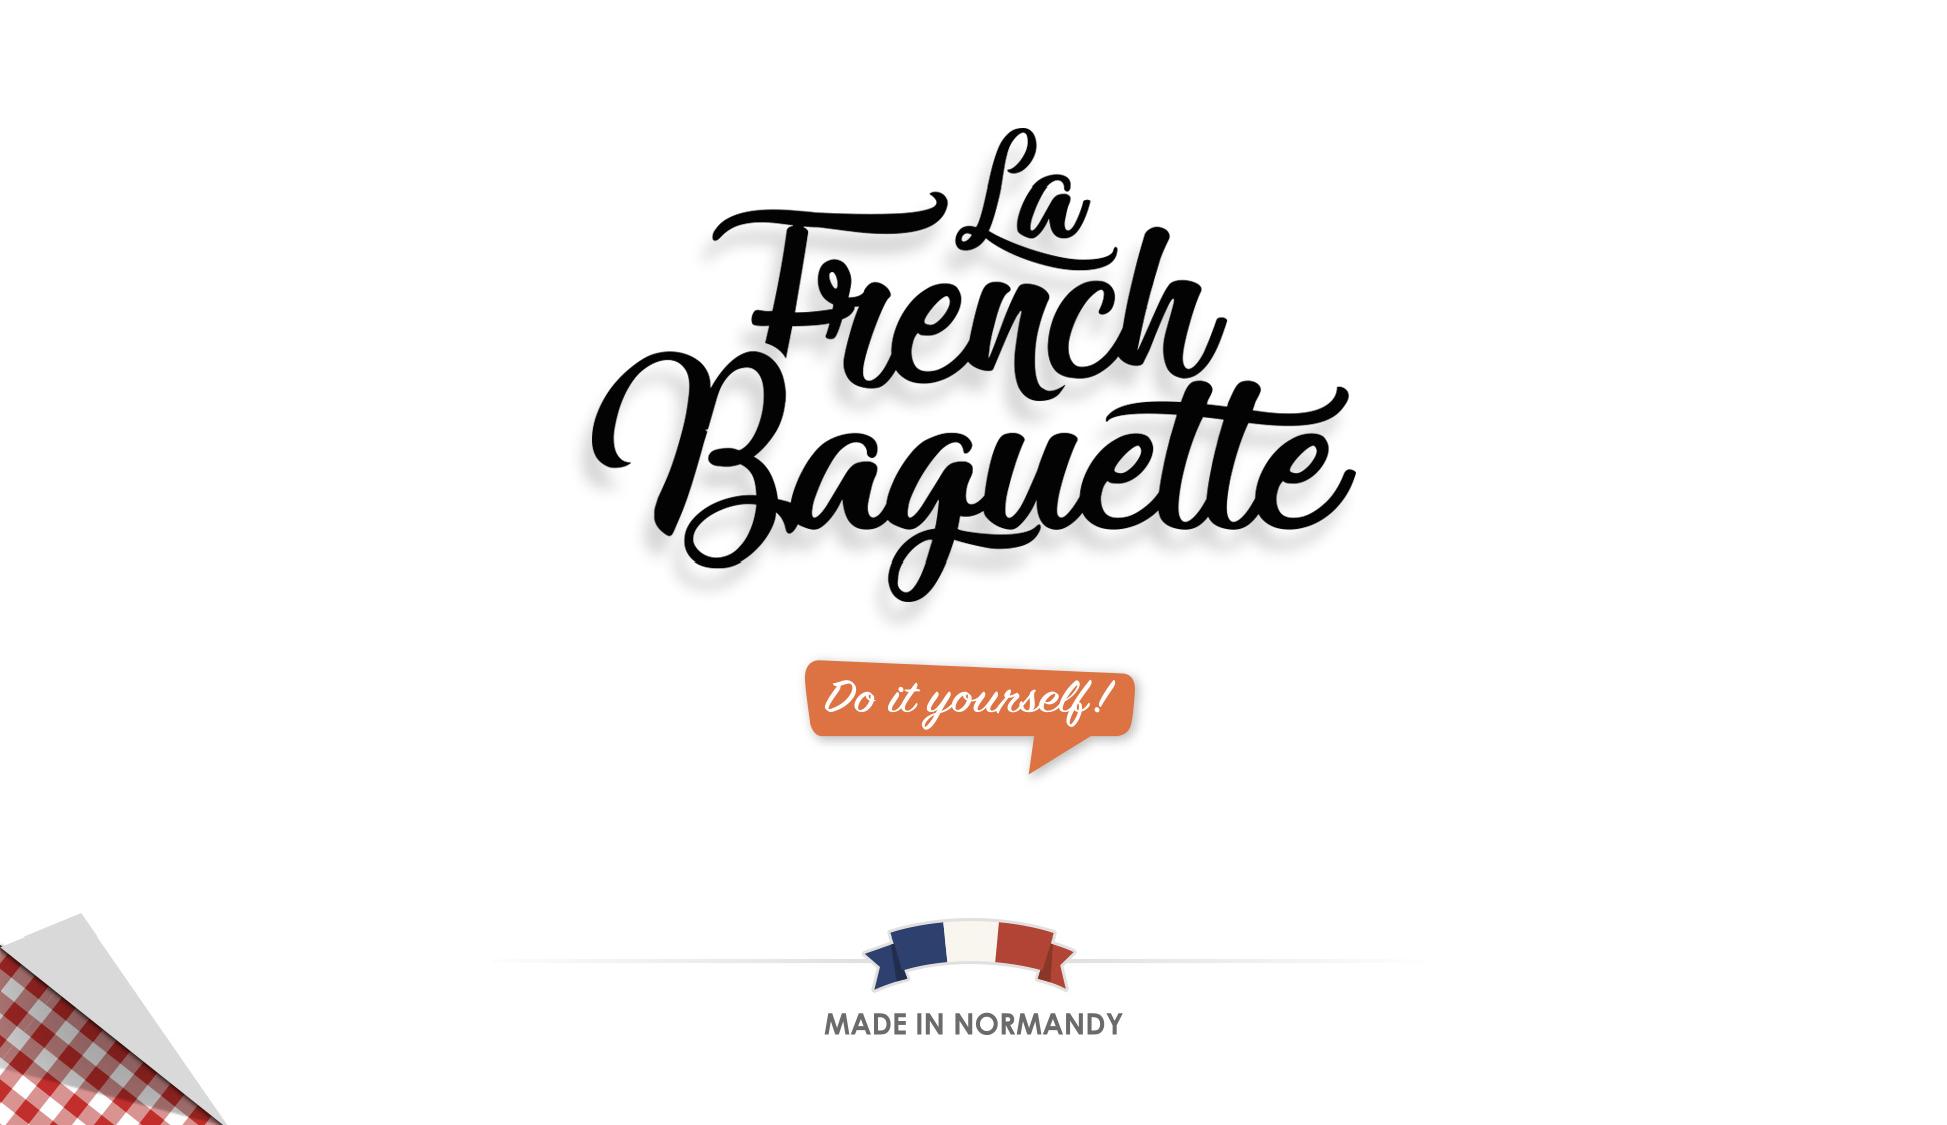 PRES_La_French_Baguette_Page_01.png